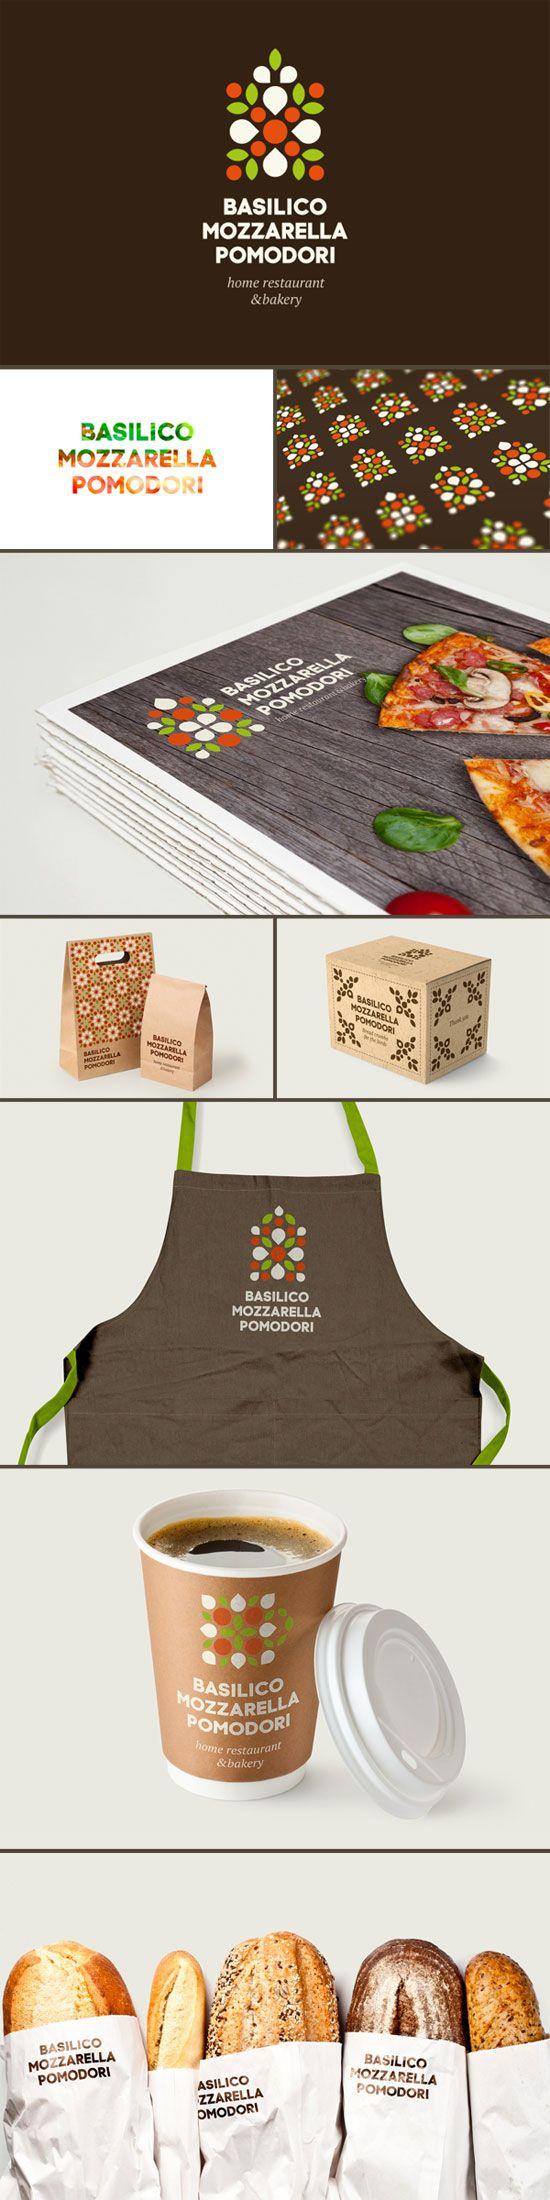 Basilico Mozzarella Pomodori Branding by Hattomonkey Studio